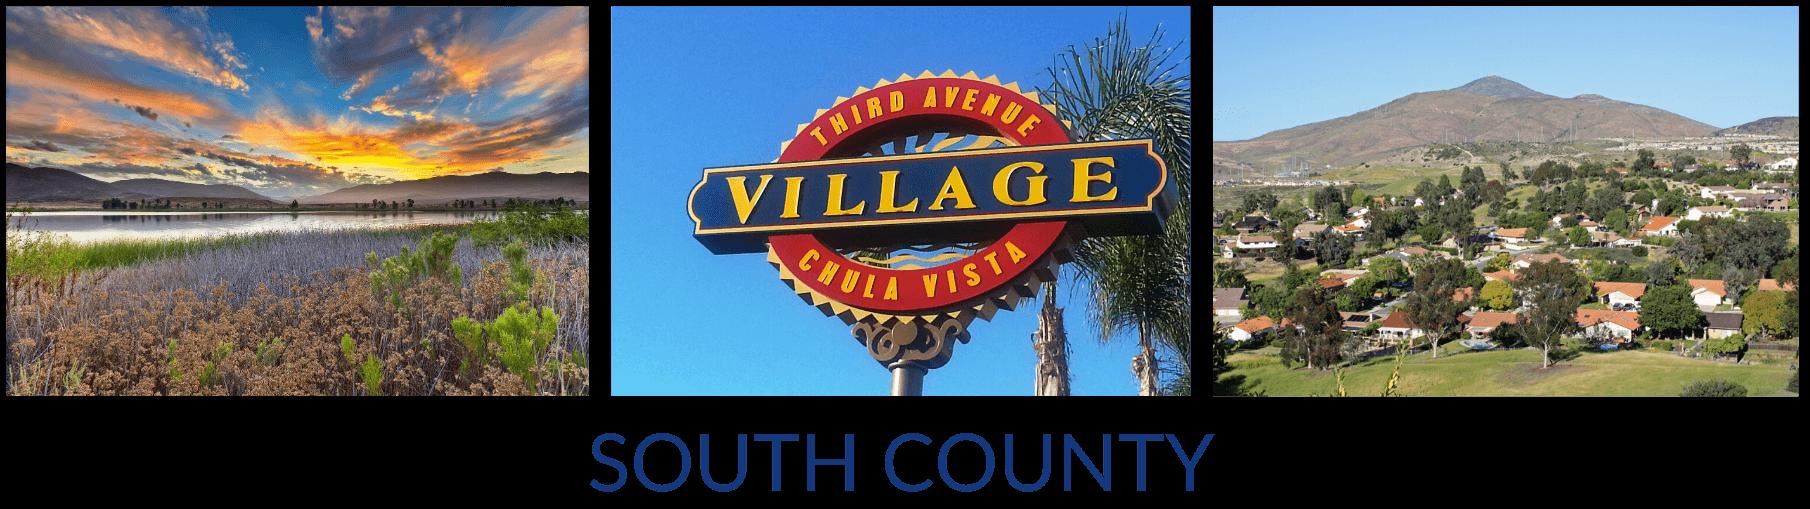 Lisa Ashkins South County-2